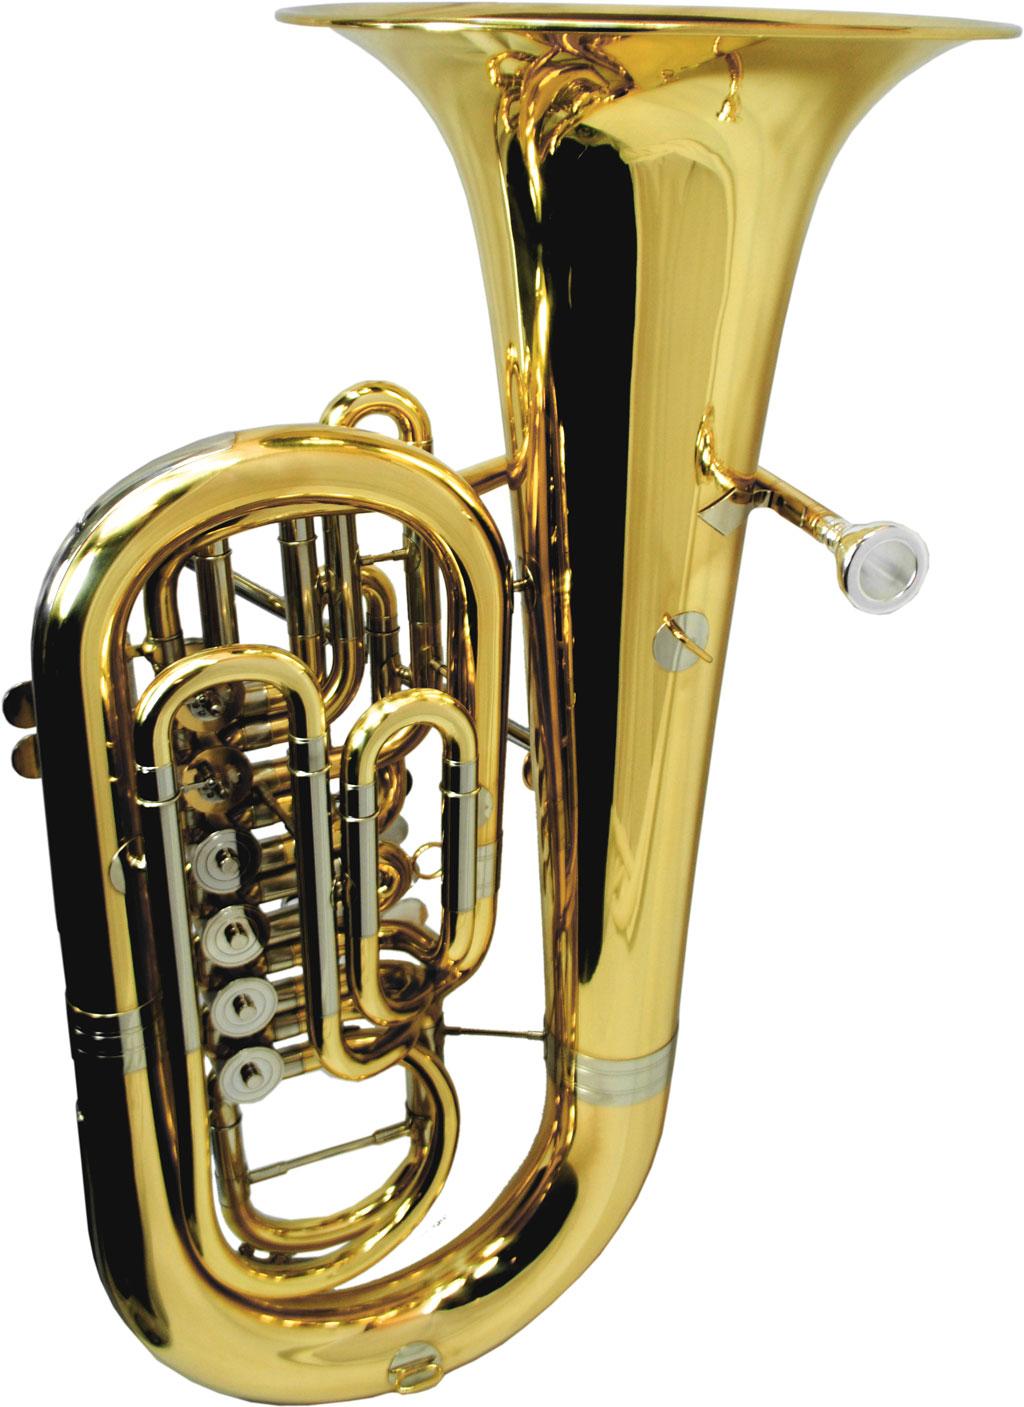 Schiller American Heritage 6 Valve Rotary F Tuba